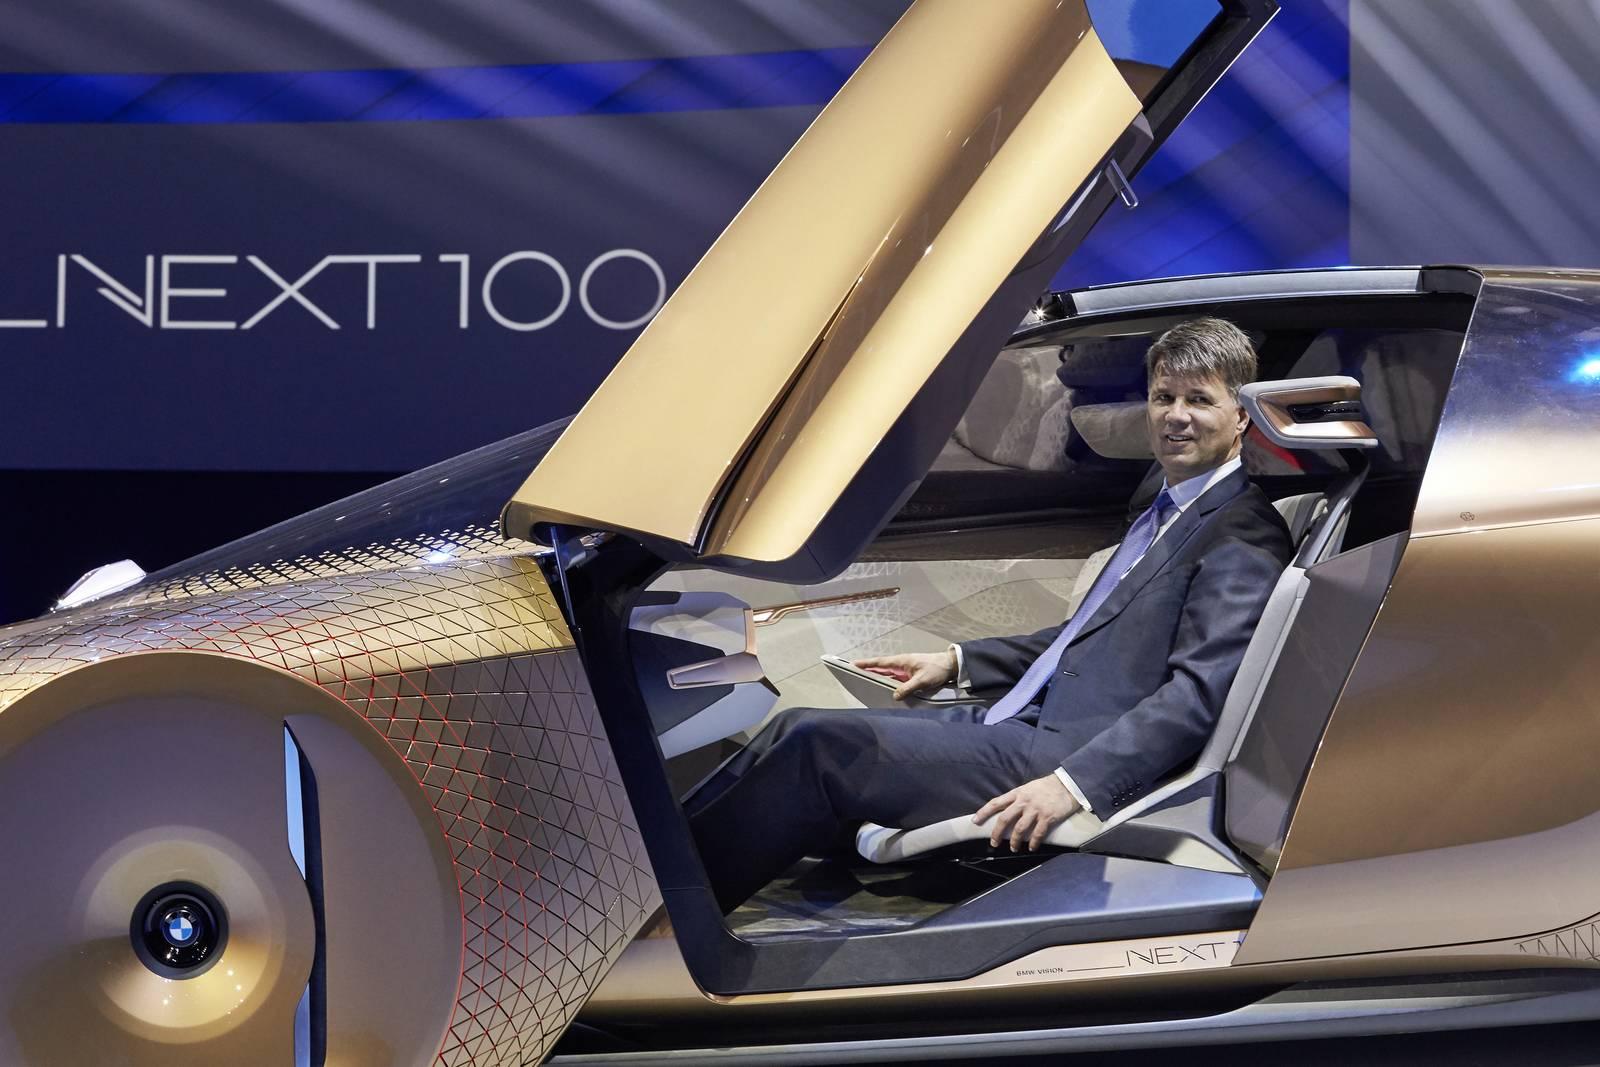 http://gtspirit.com/wp-content/uploads/2016/03/BMW-Vision-Next-100-5.jpg